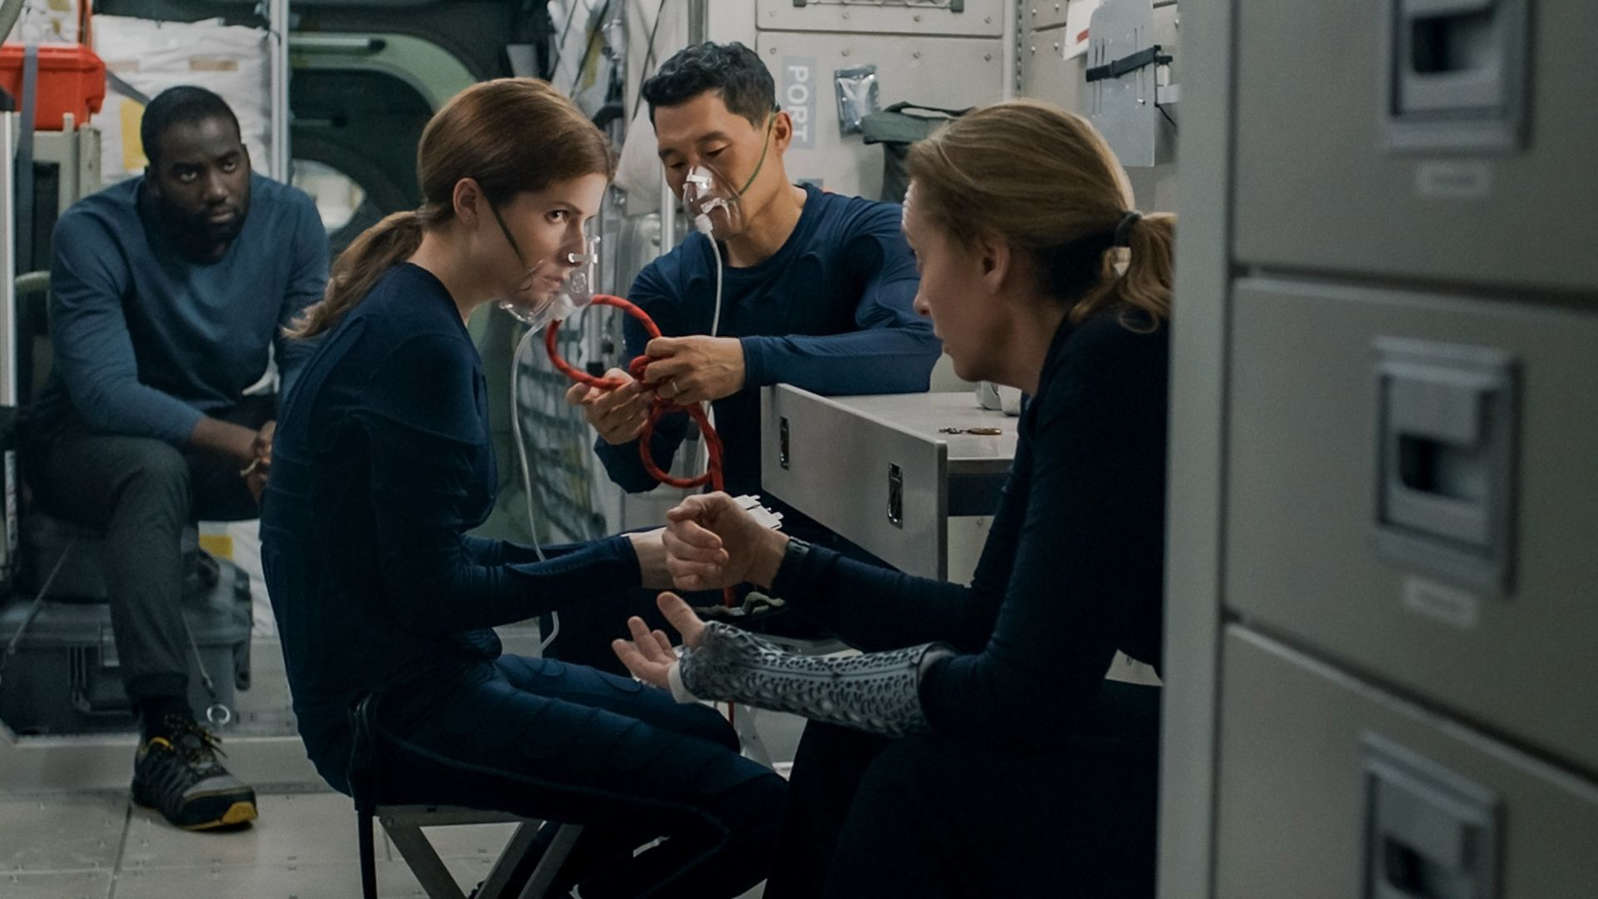 (L-R): Shamier Anderson, Anna Kendrick, Daniel Dae Kim and Toni Collette in 'Stowaway'